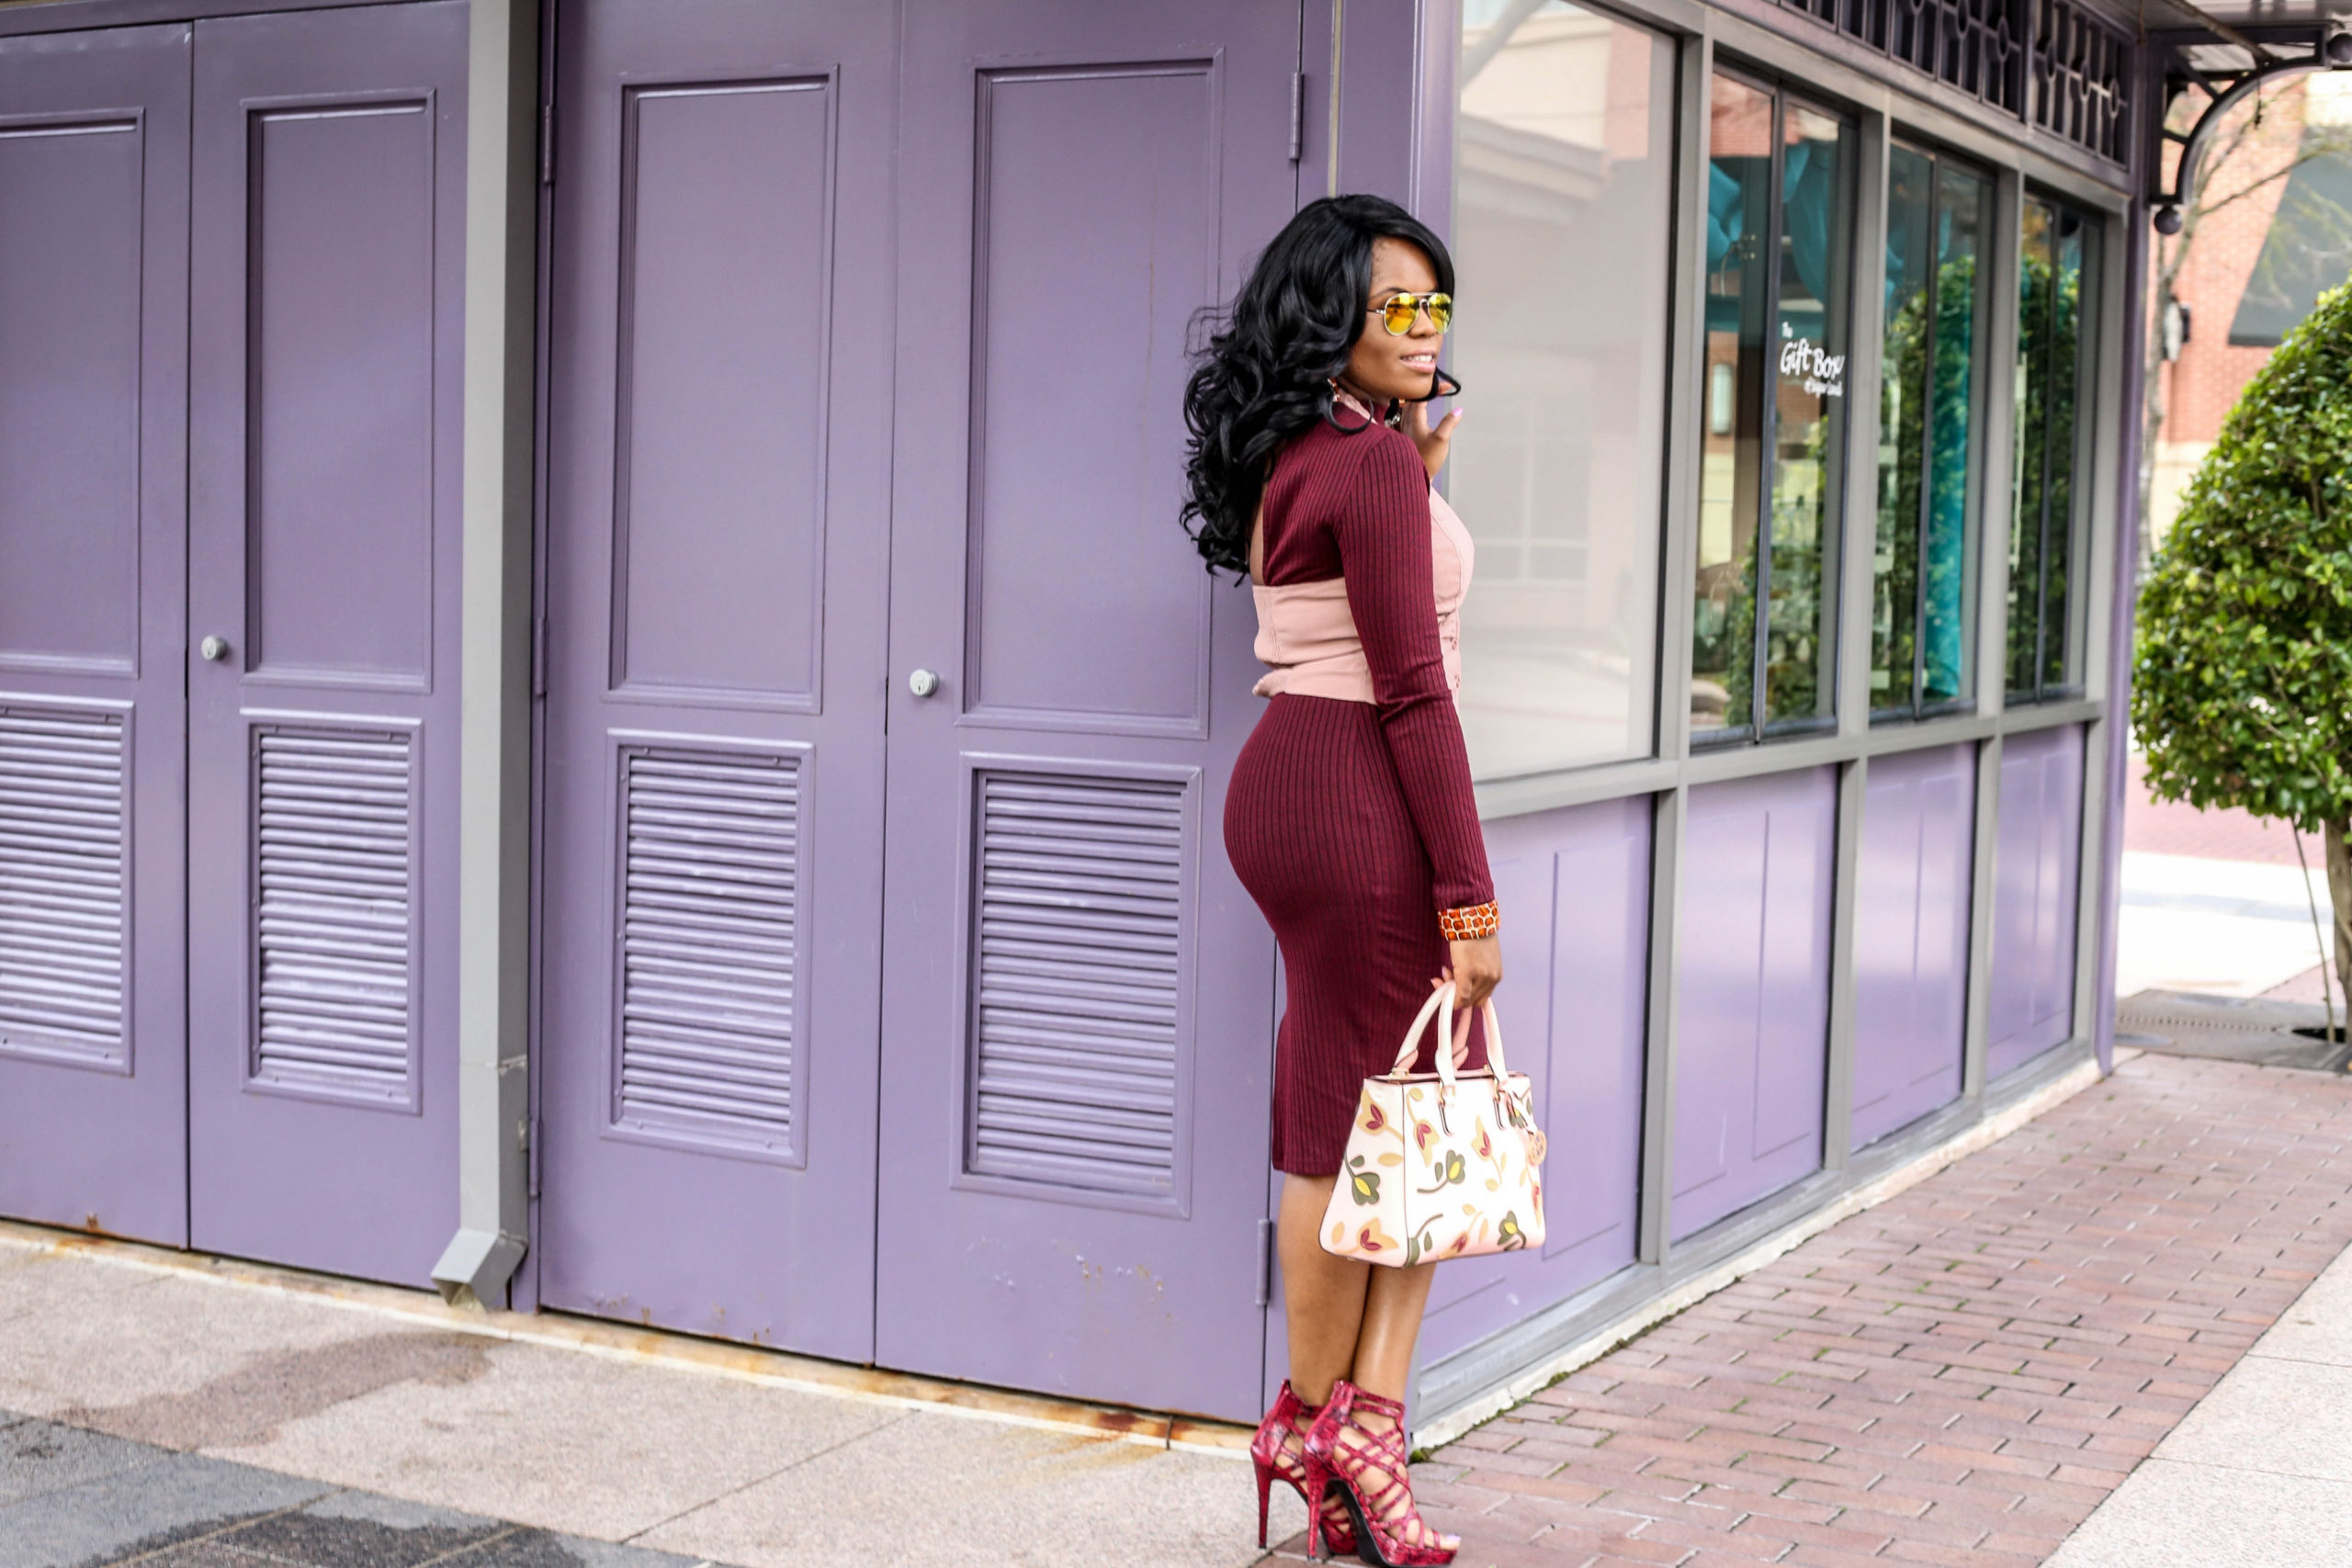 Red Knit Dress + Blush Pink Vest AGACI Burgundy Bodycon Midi Dress Blush Halter Waistcoat West 57th Floral Turnlock Satchel Handbag by Henri Bendel Red Linnie Animal Print Shoedazzle Heels Kenyan Kandy African Print Jewelry